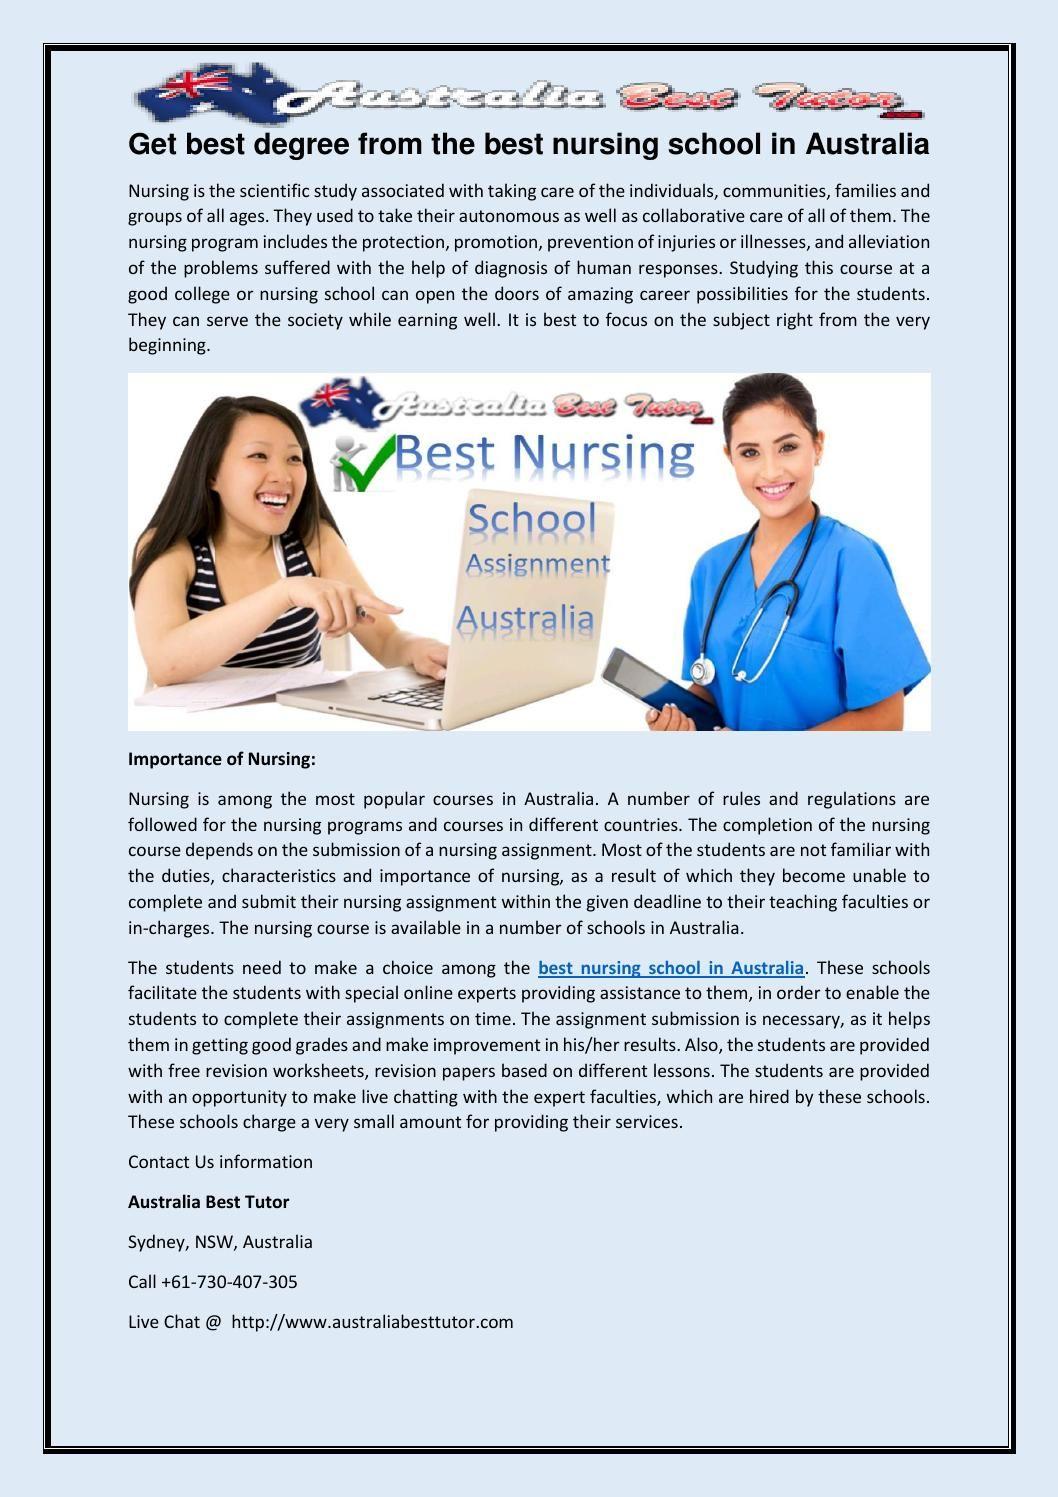 Get best degree from the best nursing school in australia